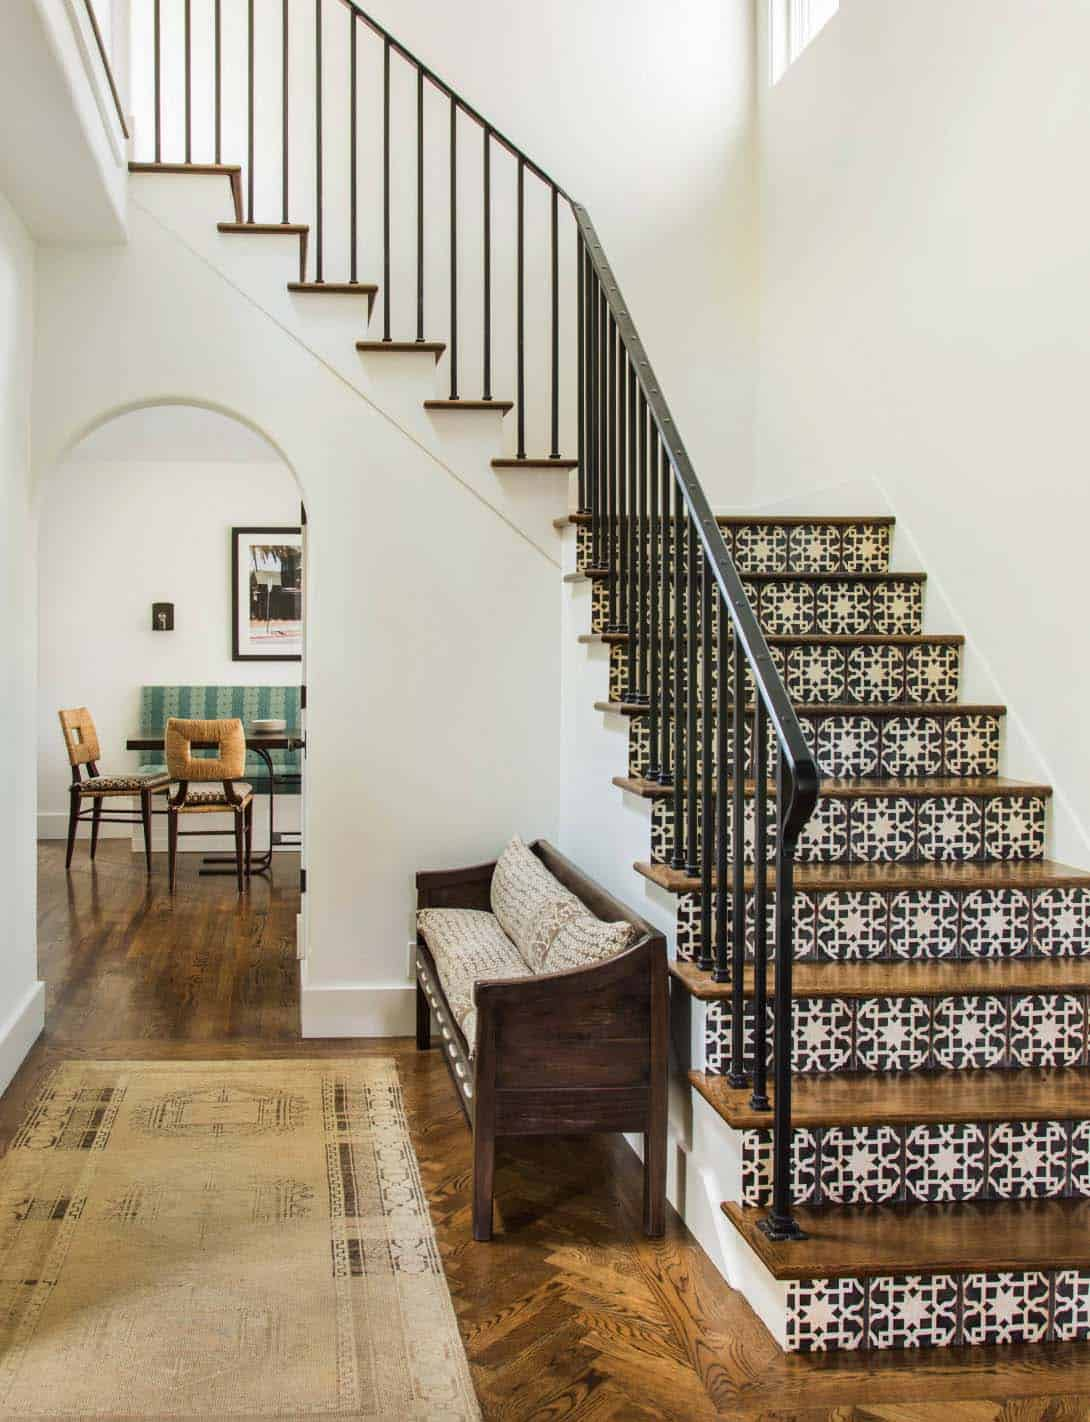 Mediterranean Style Home-Jute Interior Design-07-1 Kindesign